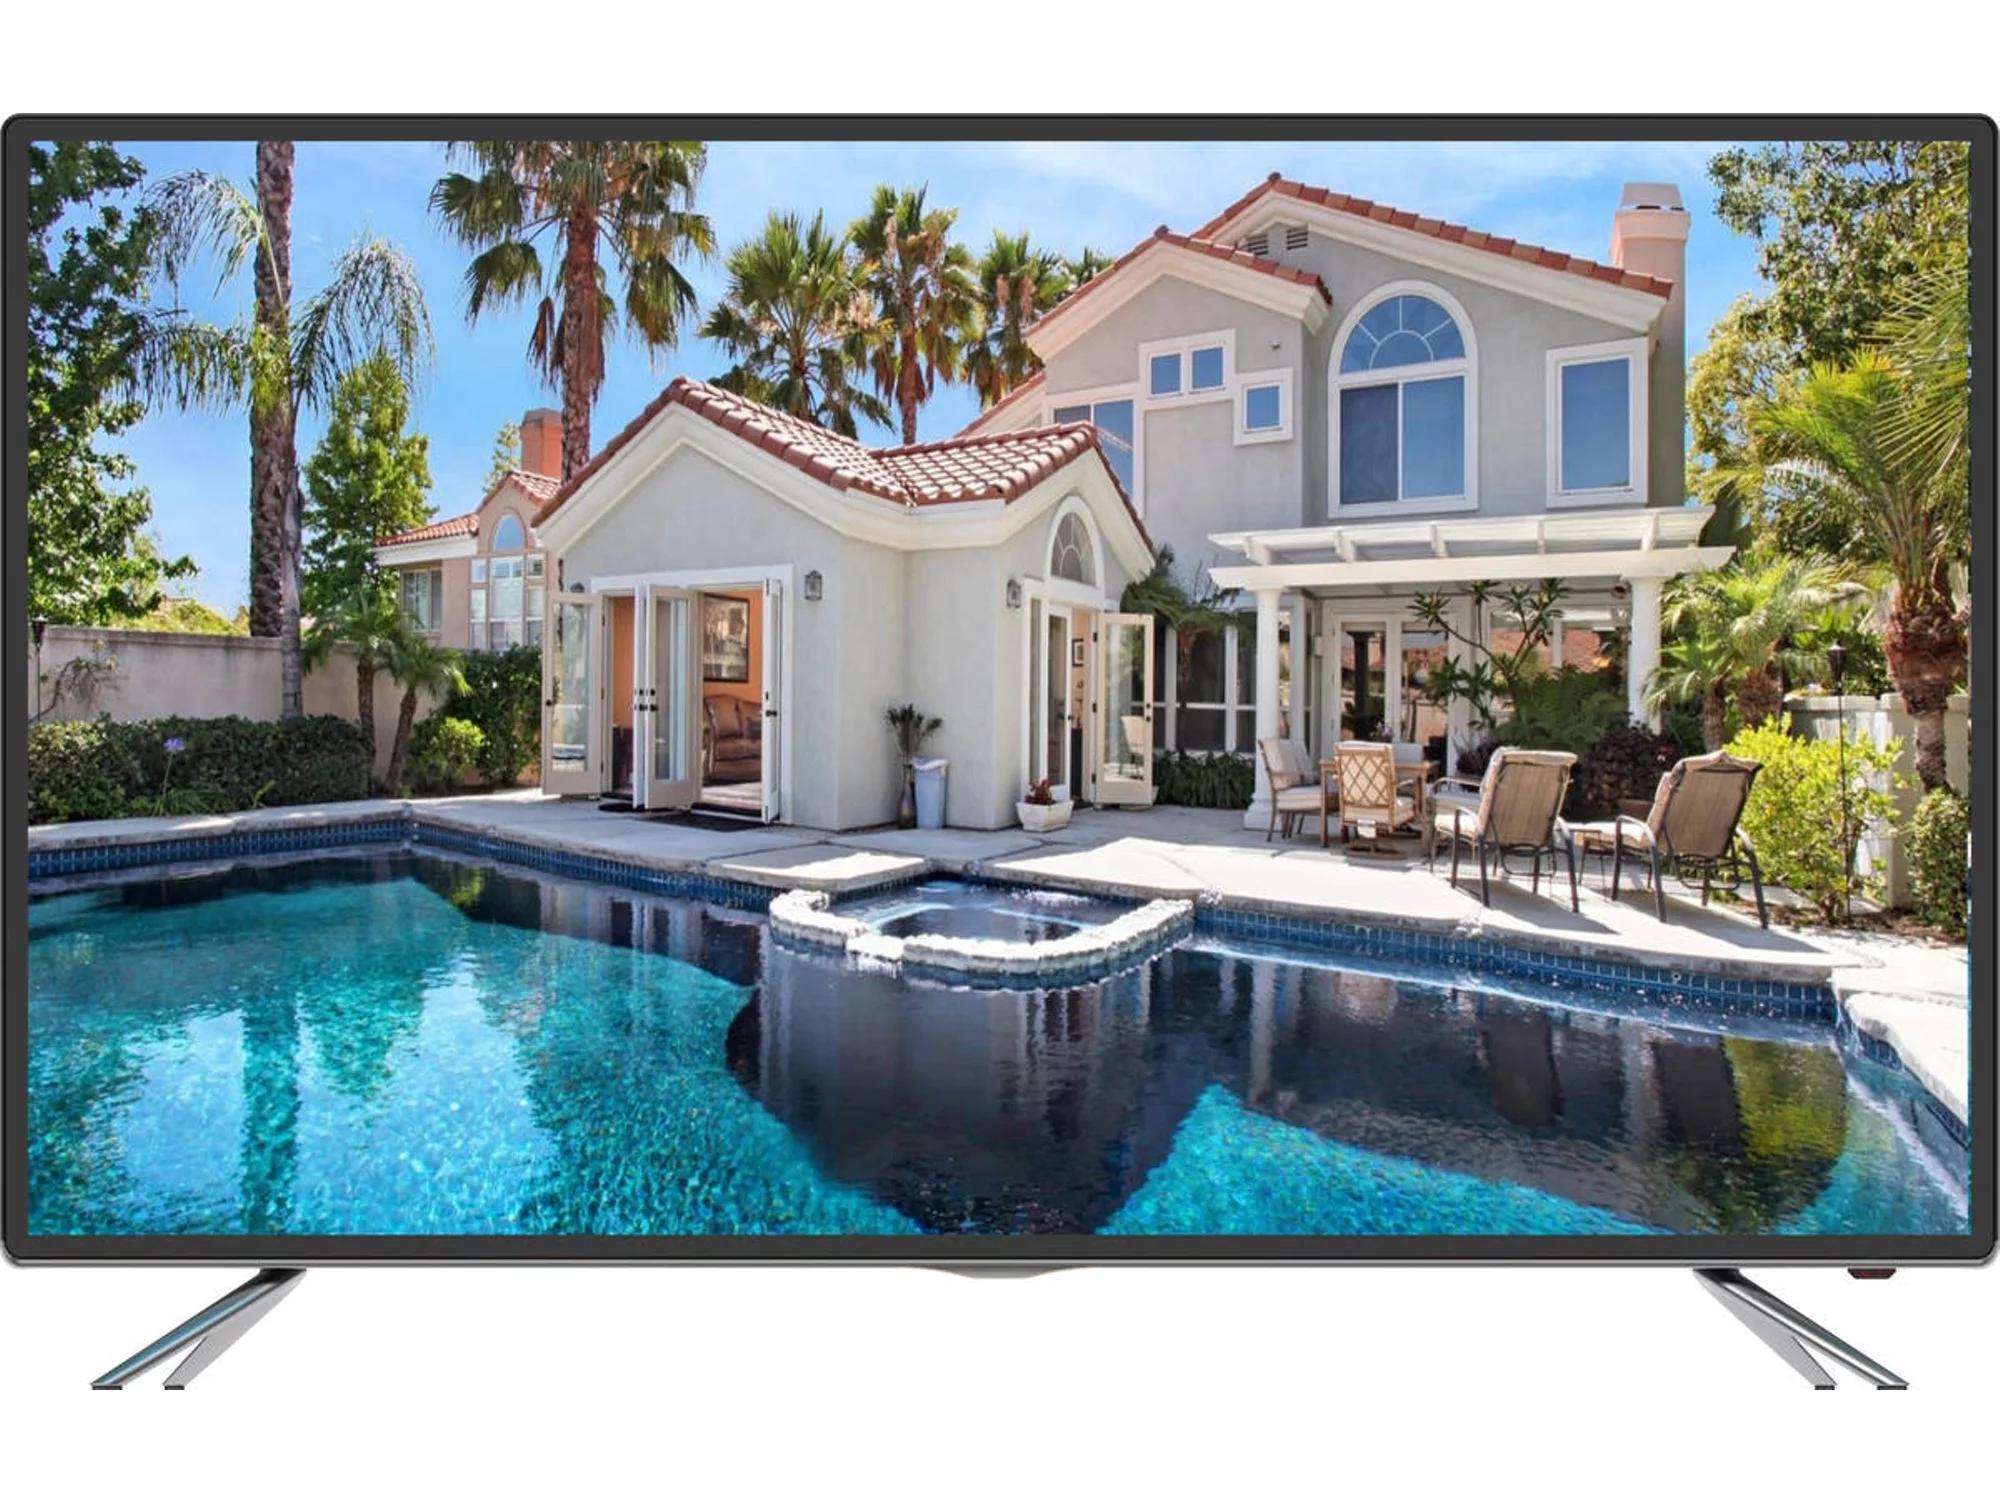 TV SMART TECH 55'' LED - 4K Ultra HD - Smart TV